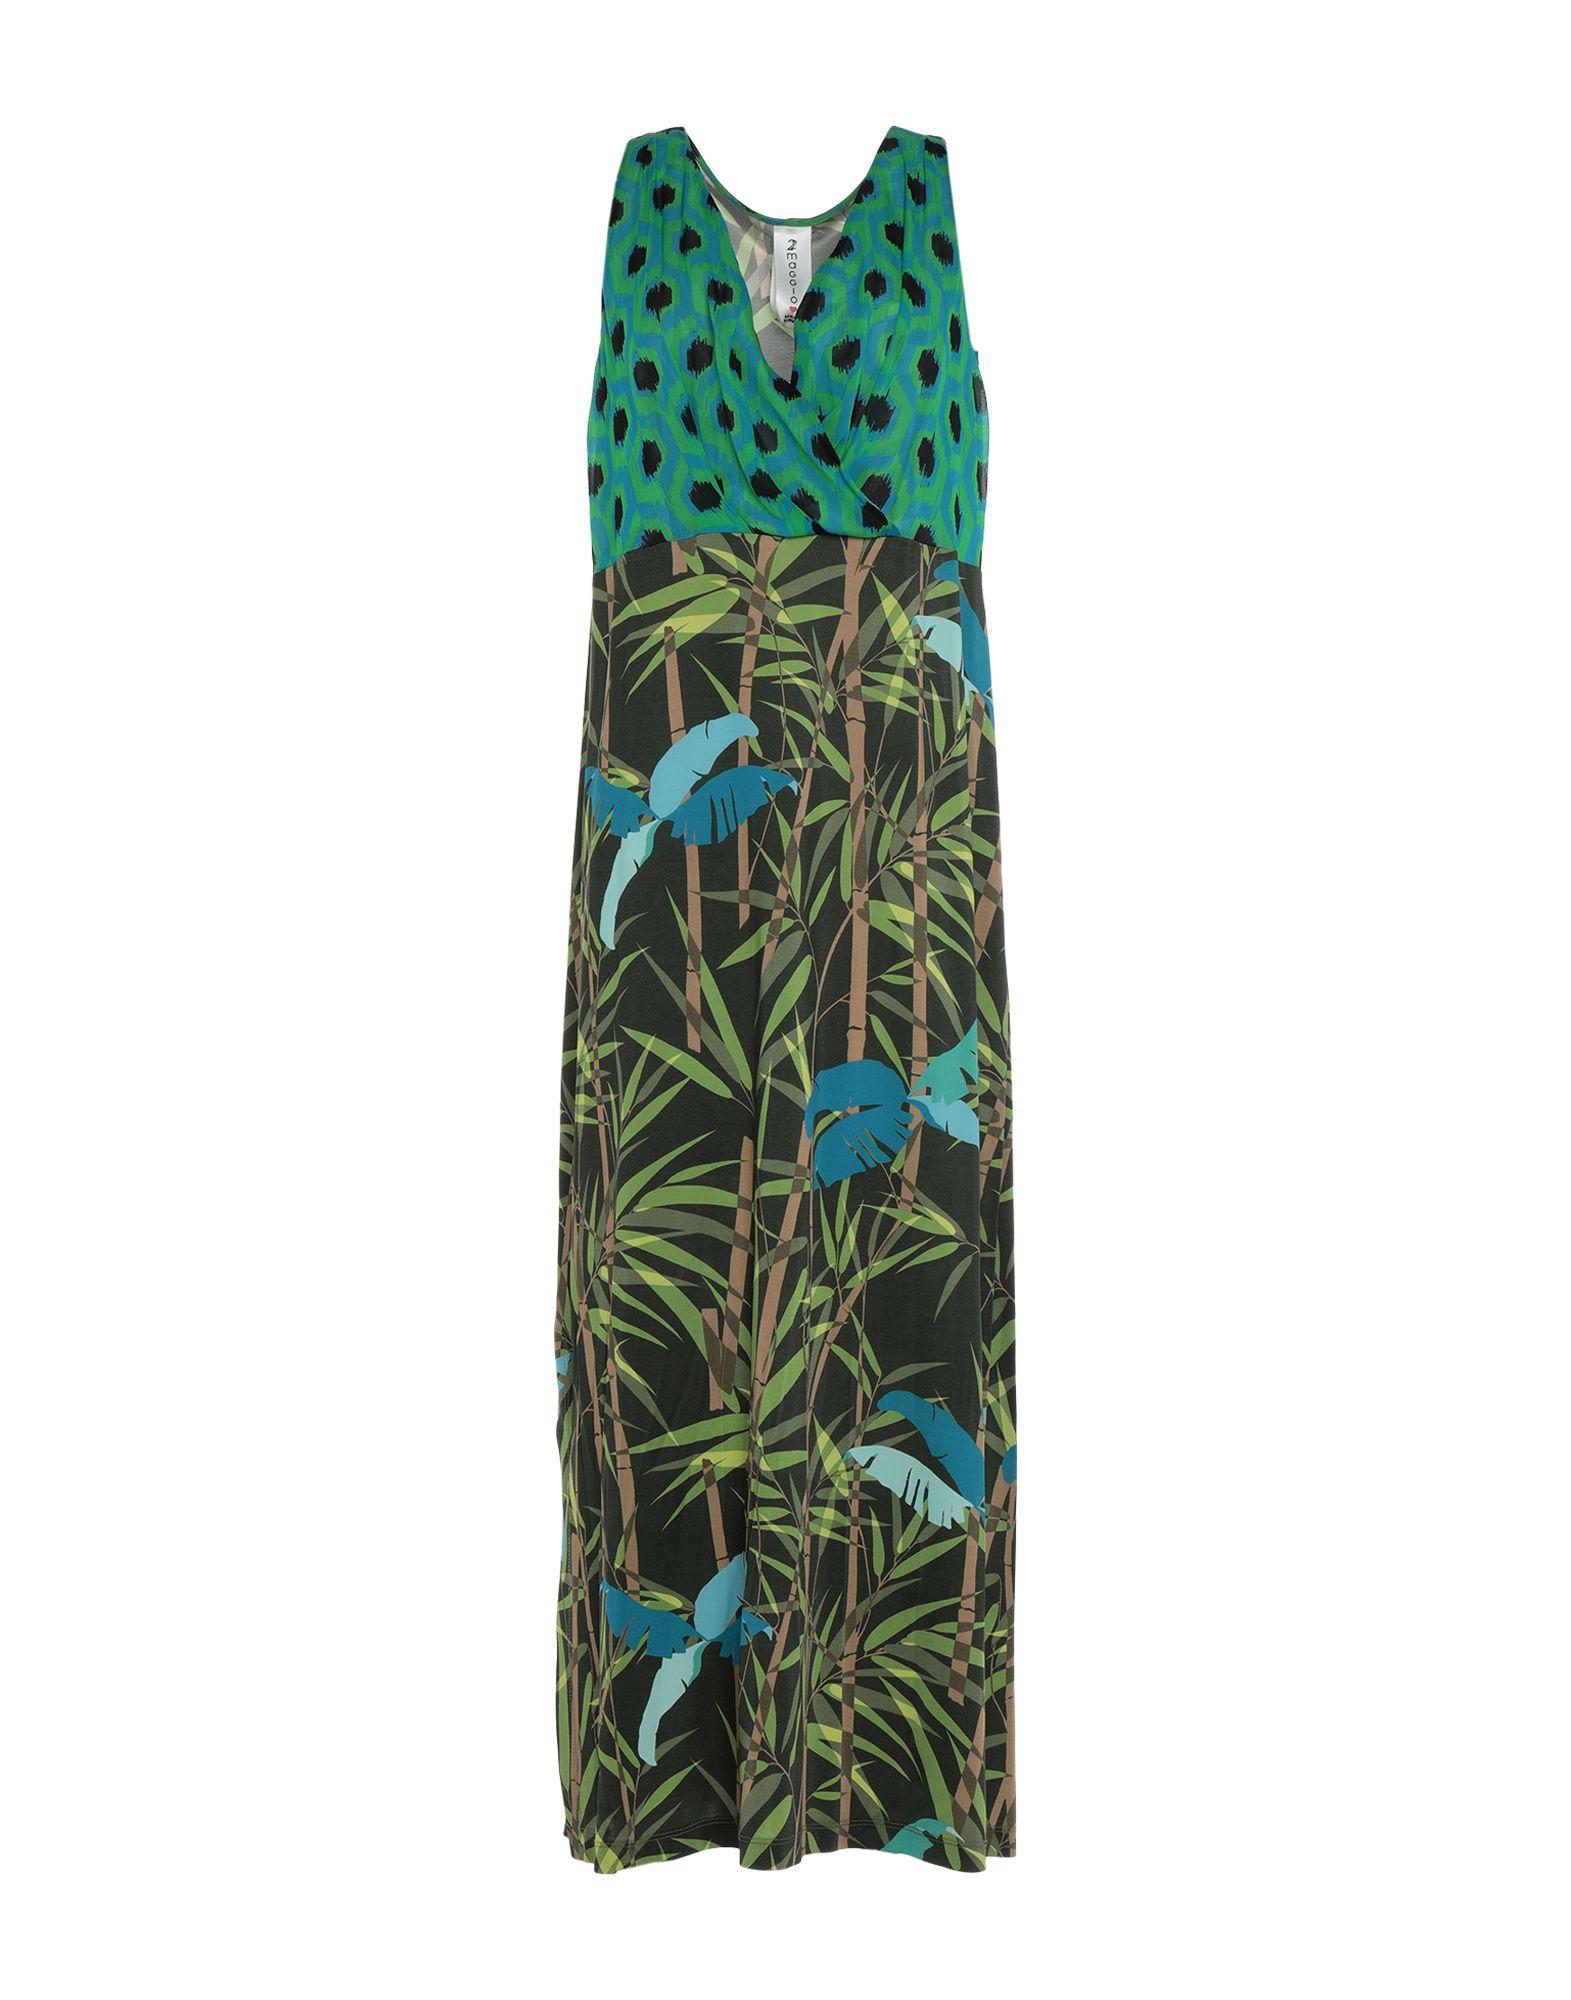 22 MAGGIO by MARIA GRAZIA SEVERI Длинное платье свободное платье с гипюром 22 maggio